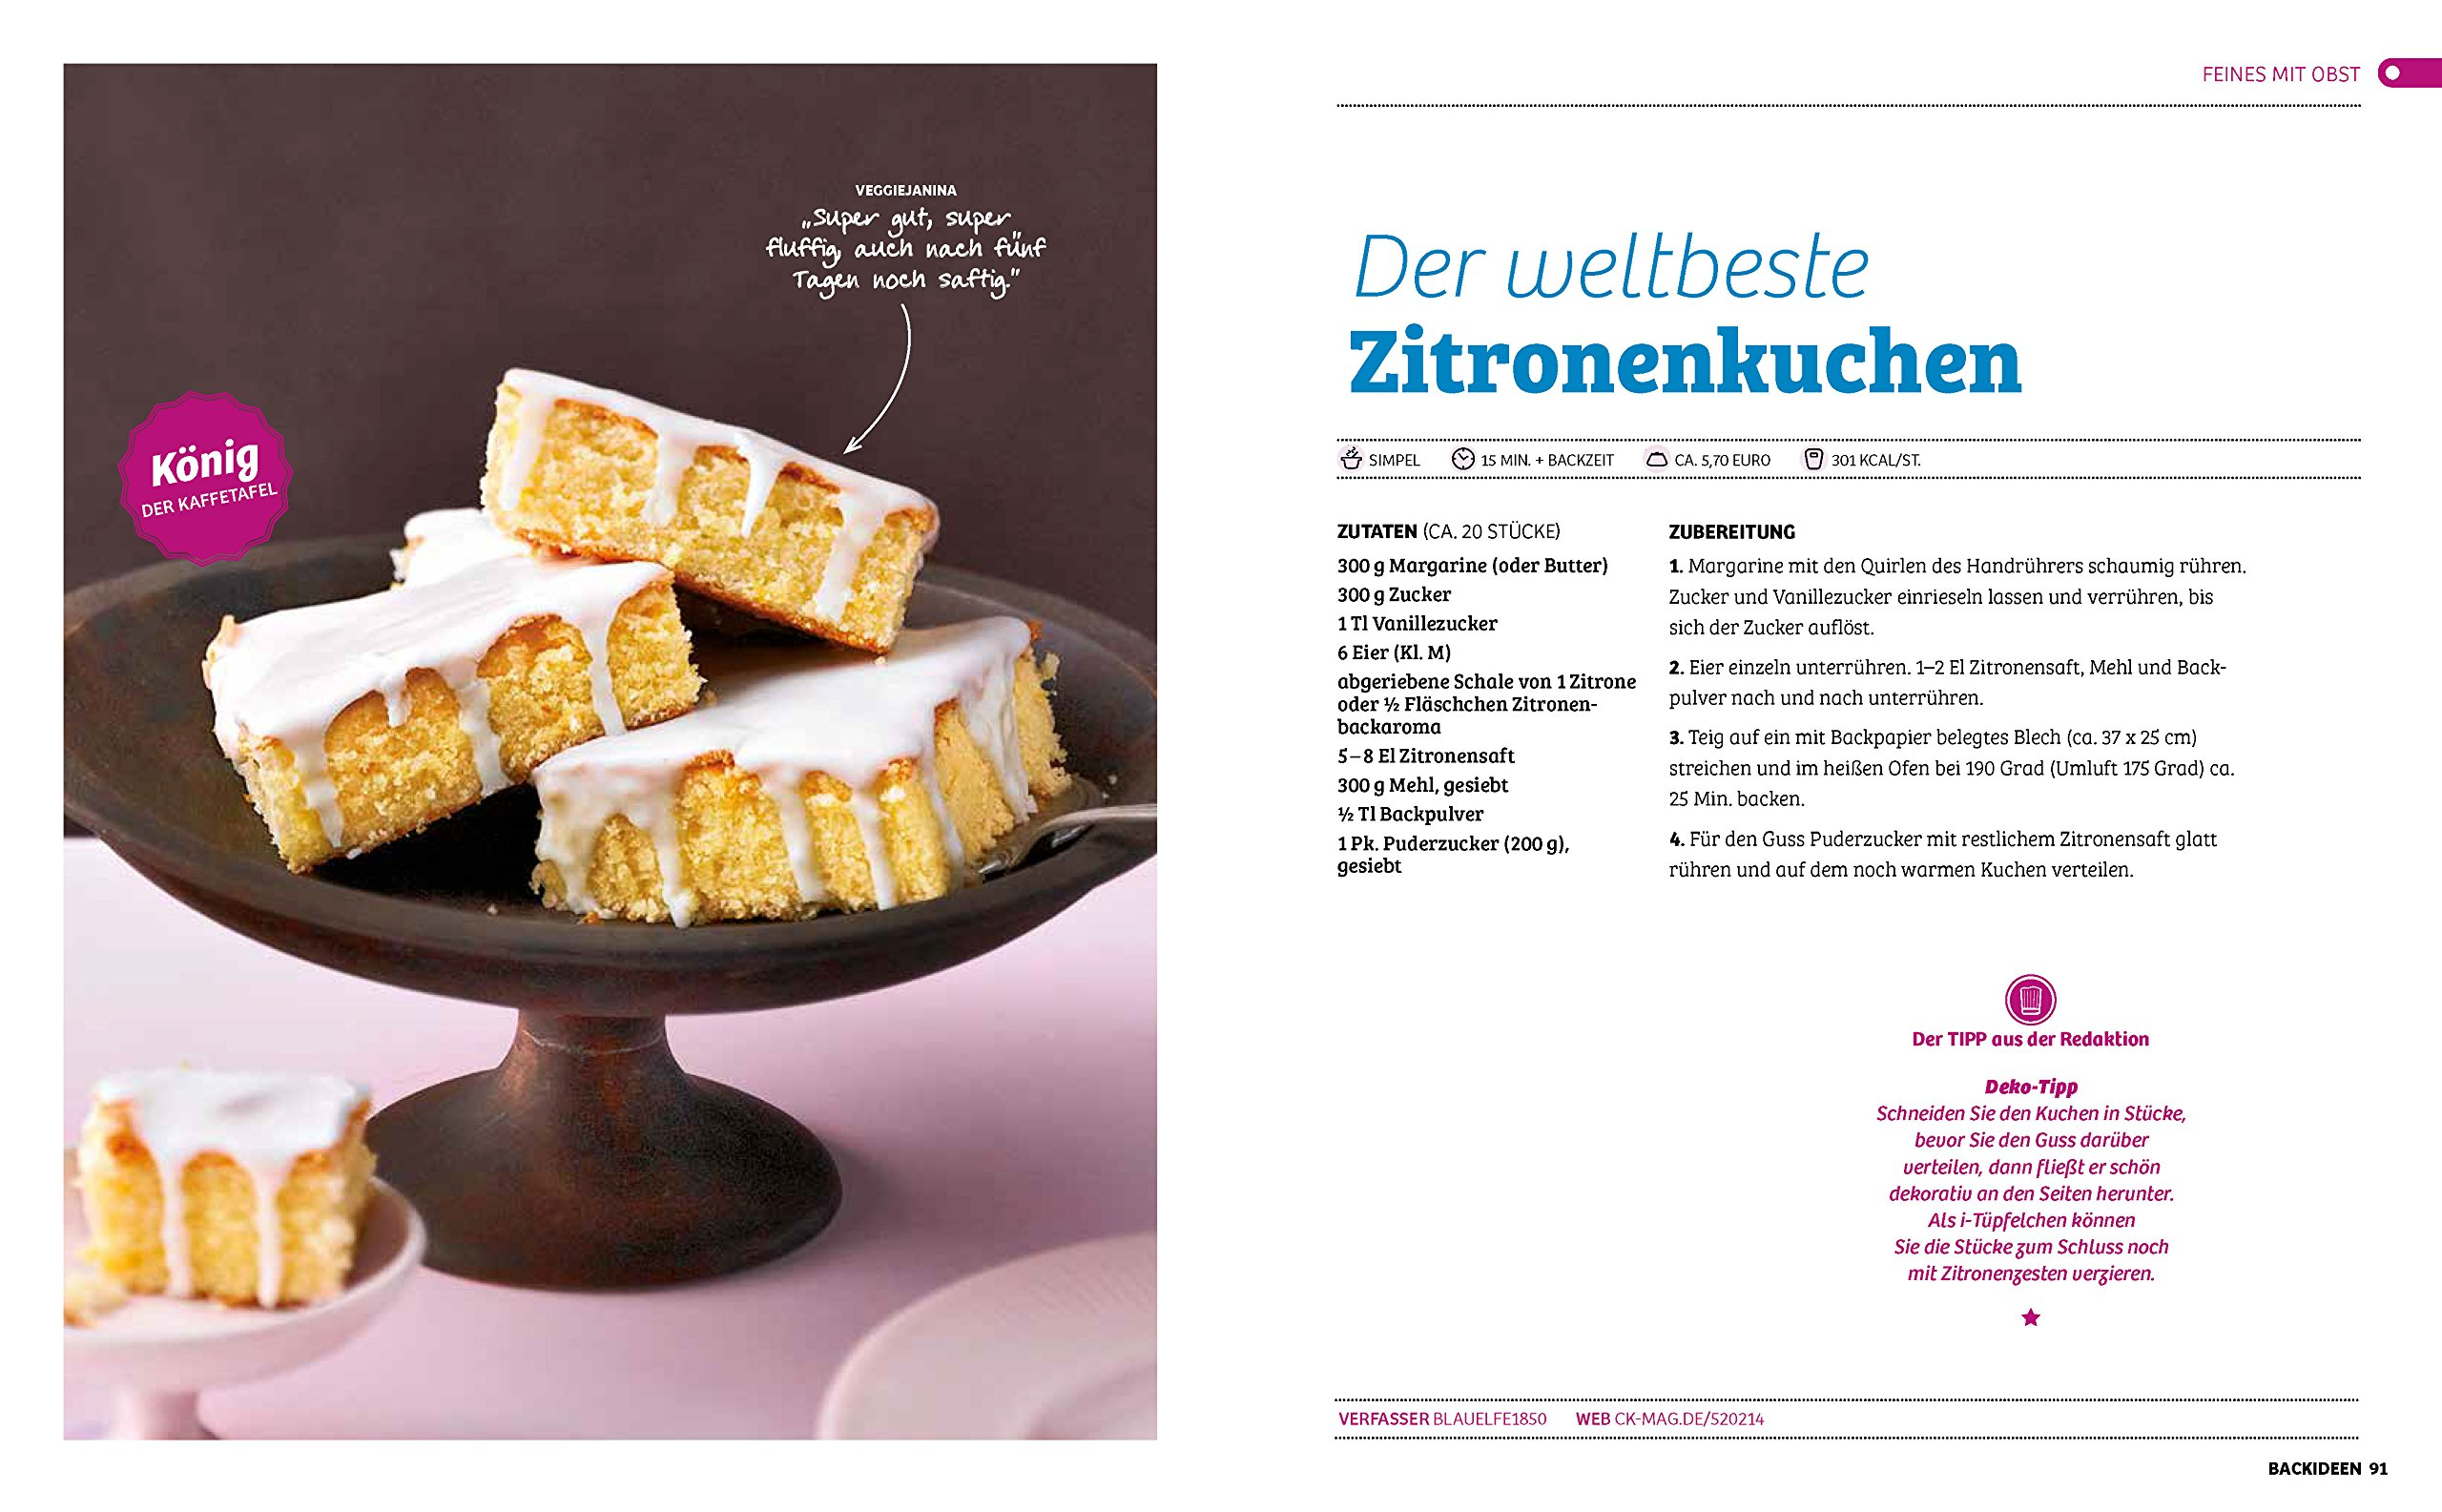 Groß Küche Back Ideen 2014 Bilder - Küchenschrank Ideen - eastbound.info